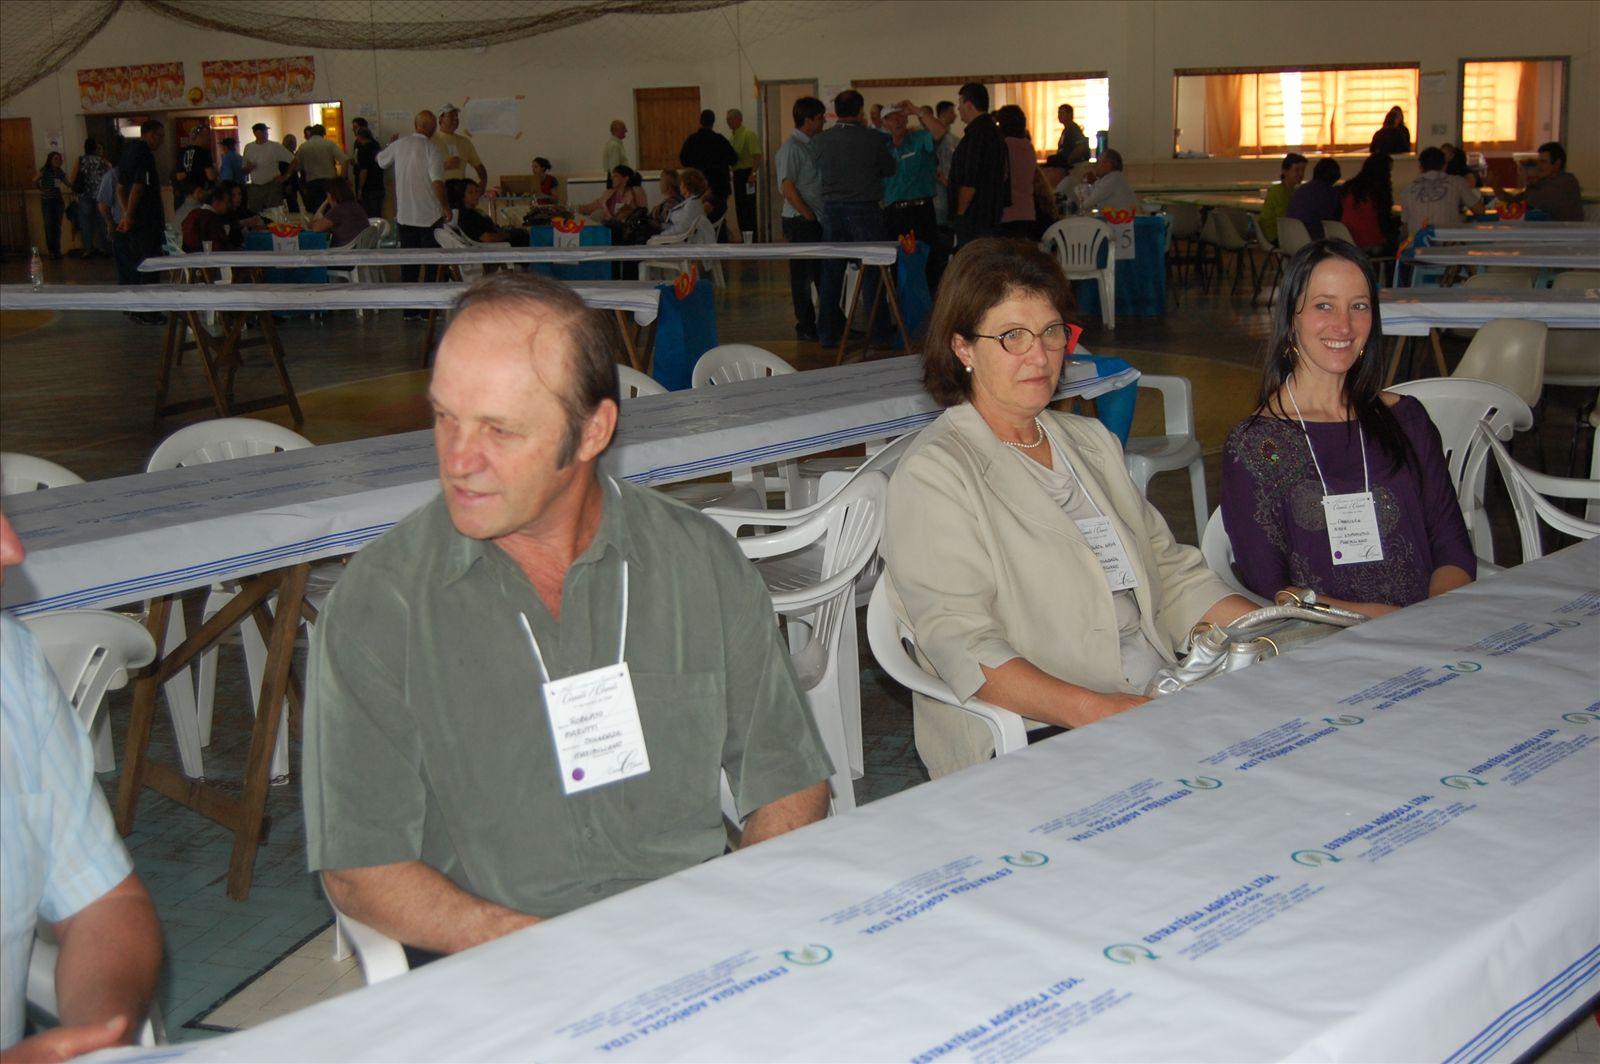 2º Encontro Família Cornelli - 11.10.2009 (83)_0